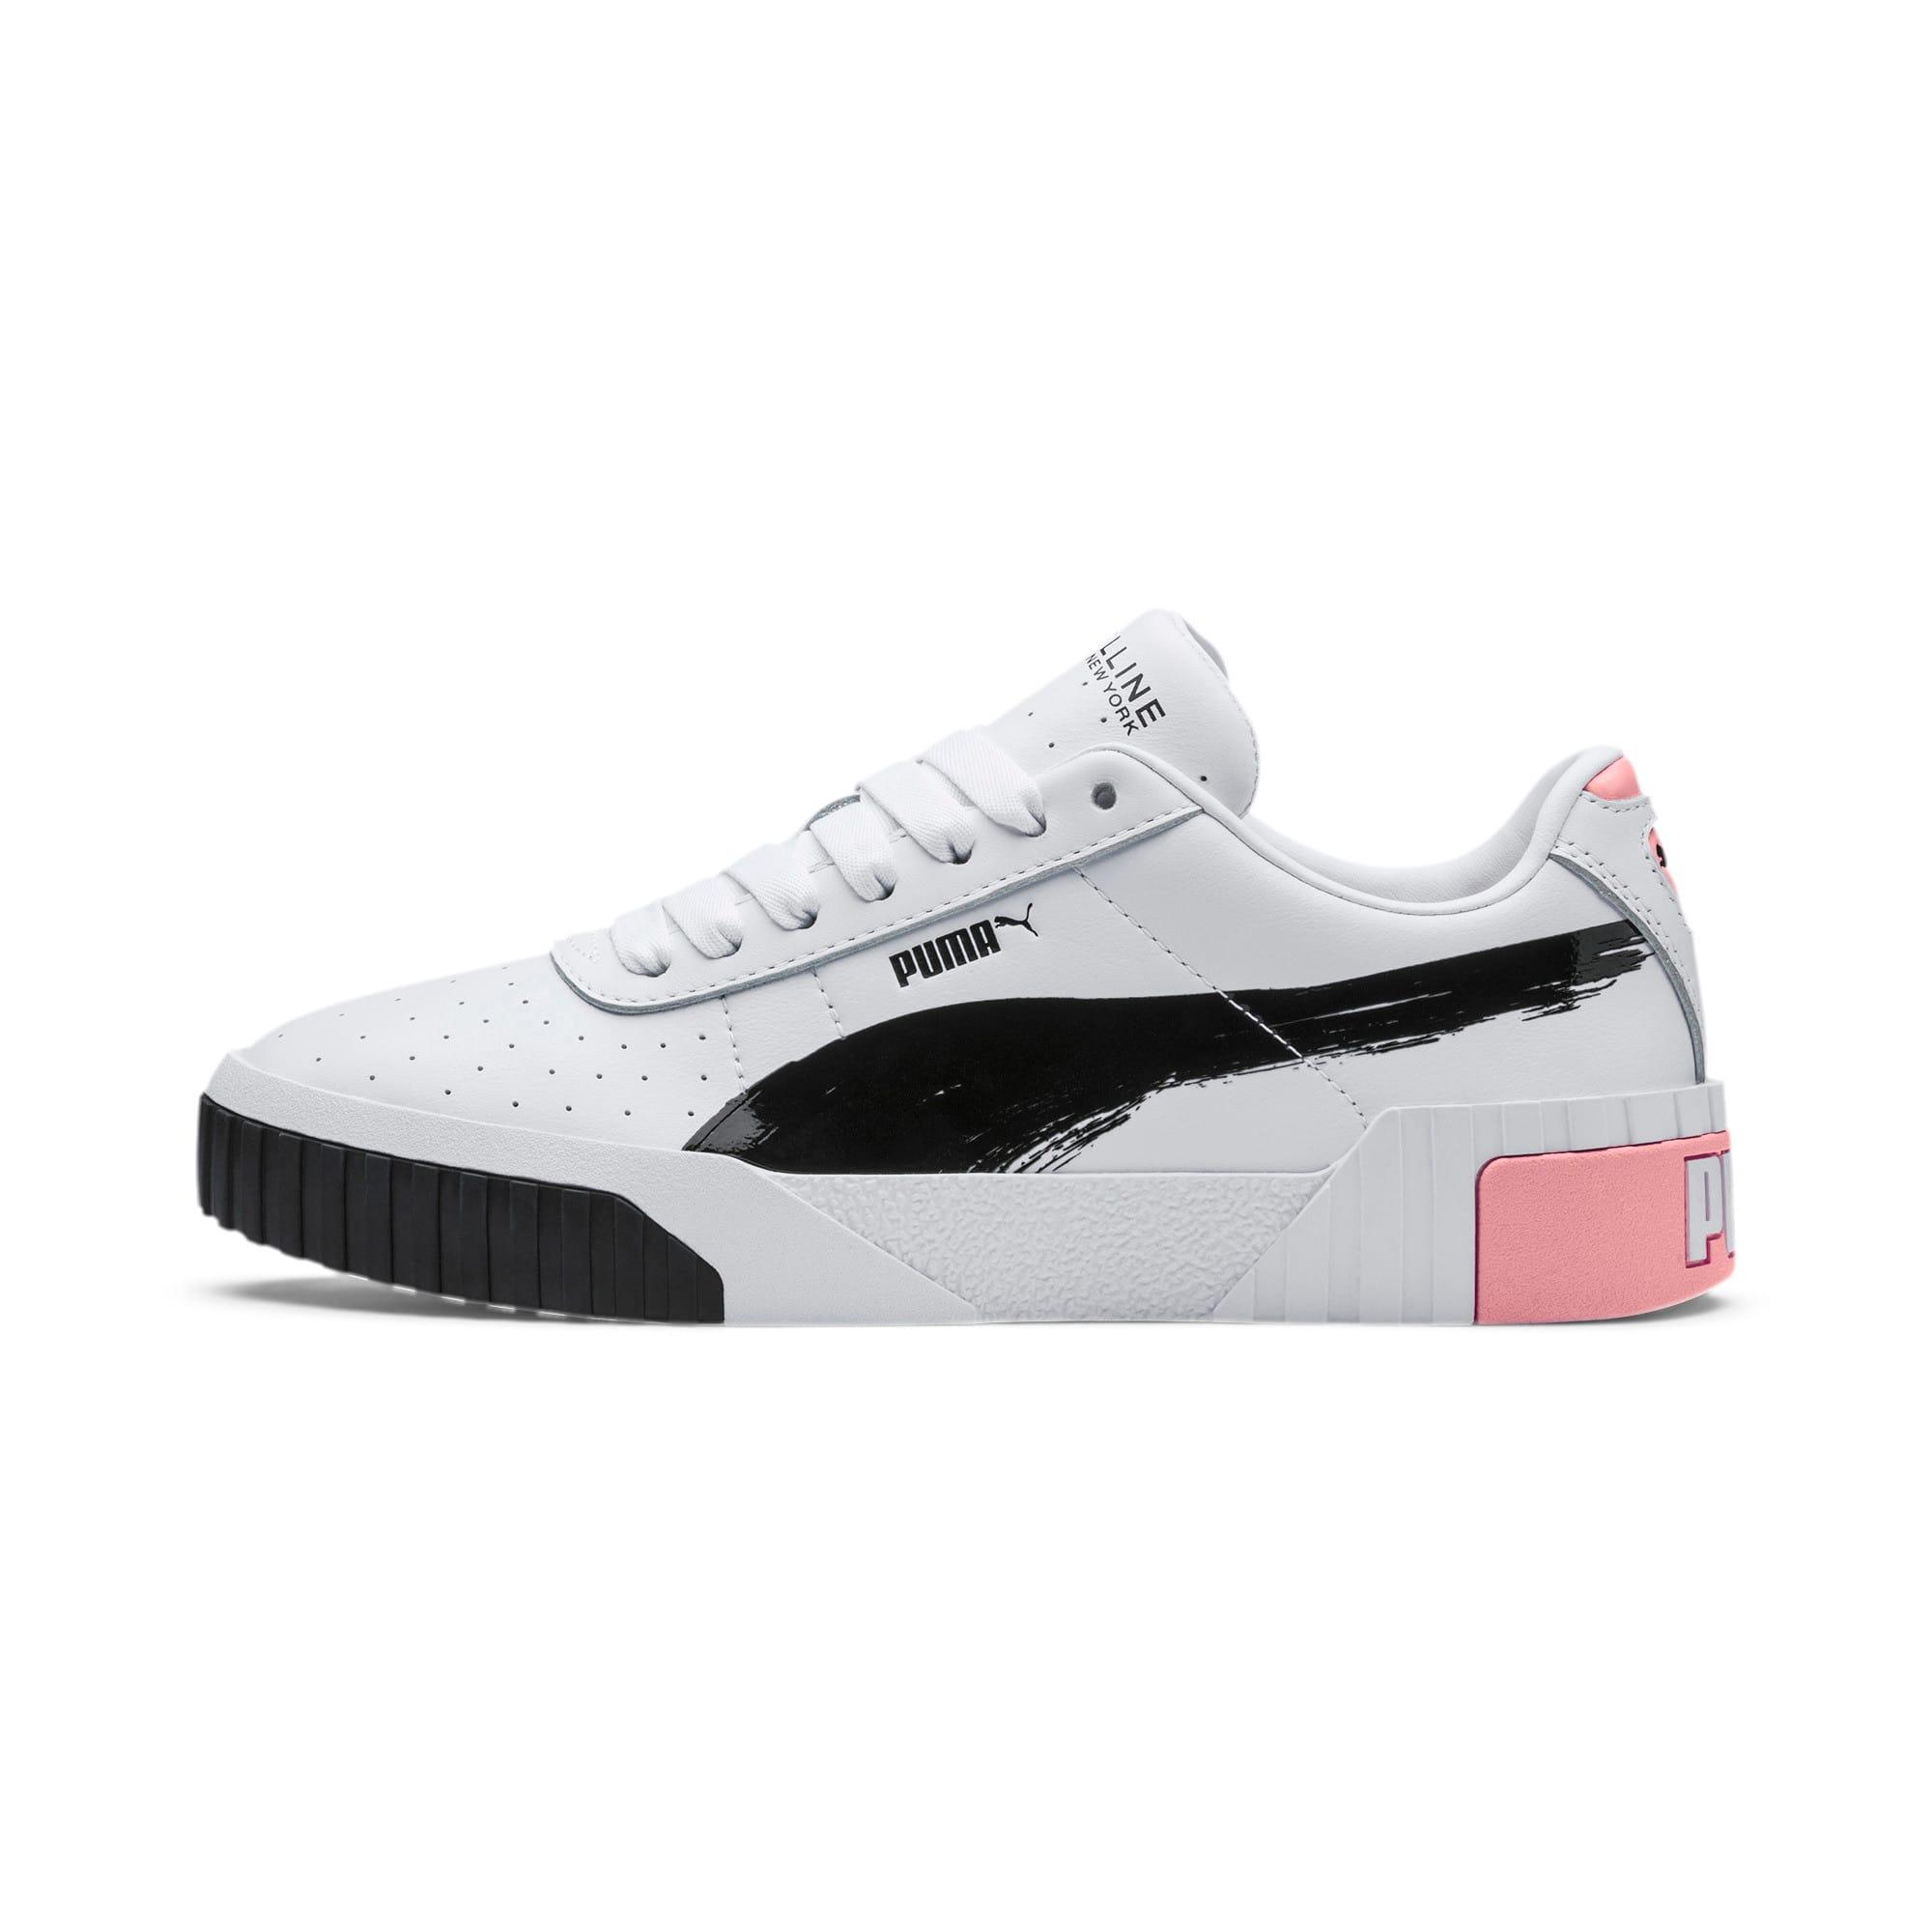 Thumbnail 1 of PUMA x MAYBELLINE Cali Women's Sneakers, Puma White-Puma Black, medium